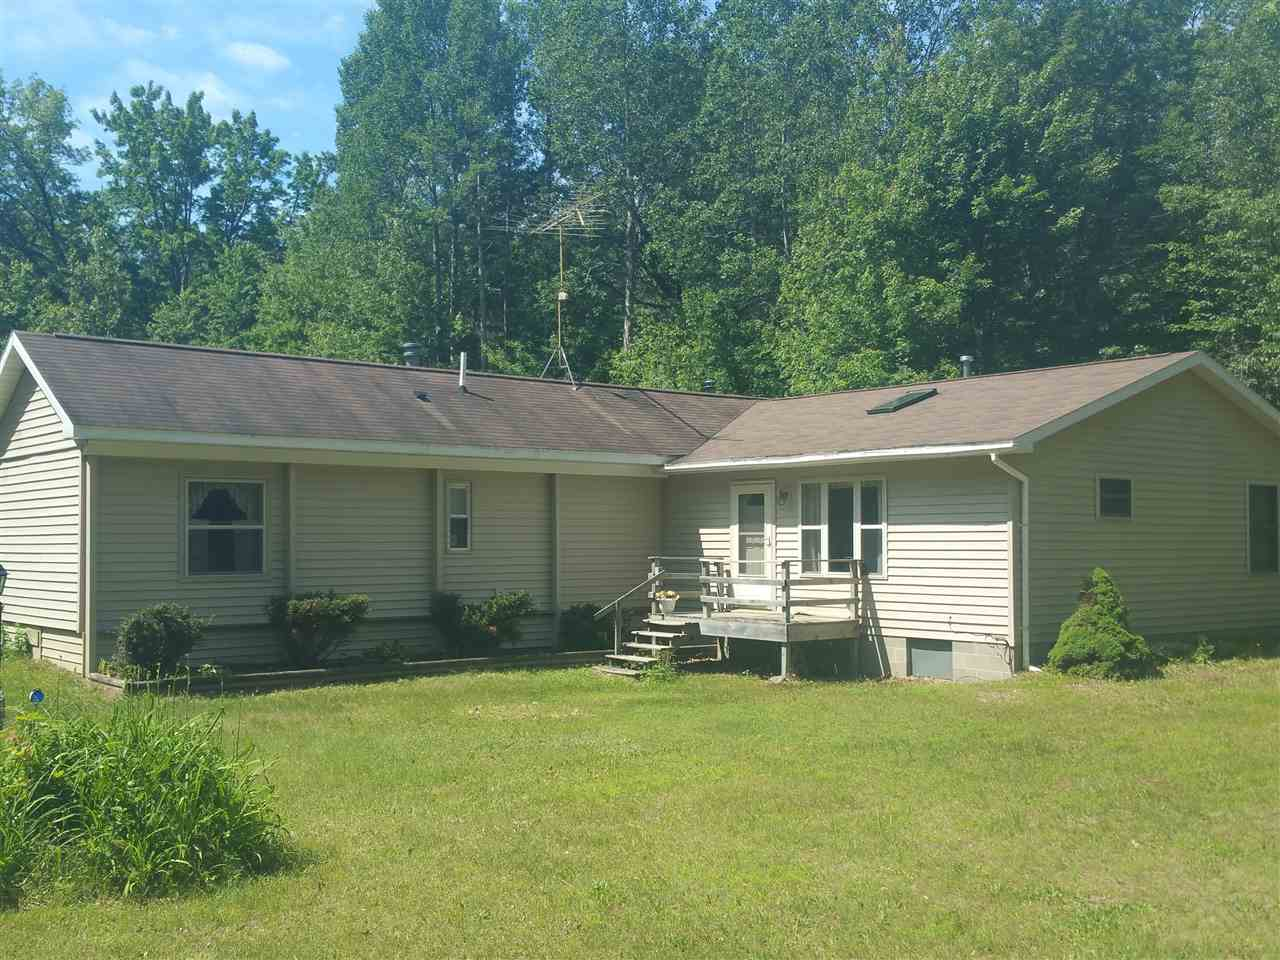 Real Estate for Sale, ListingId: 34328974, Houghton Lake,MI48629